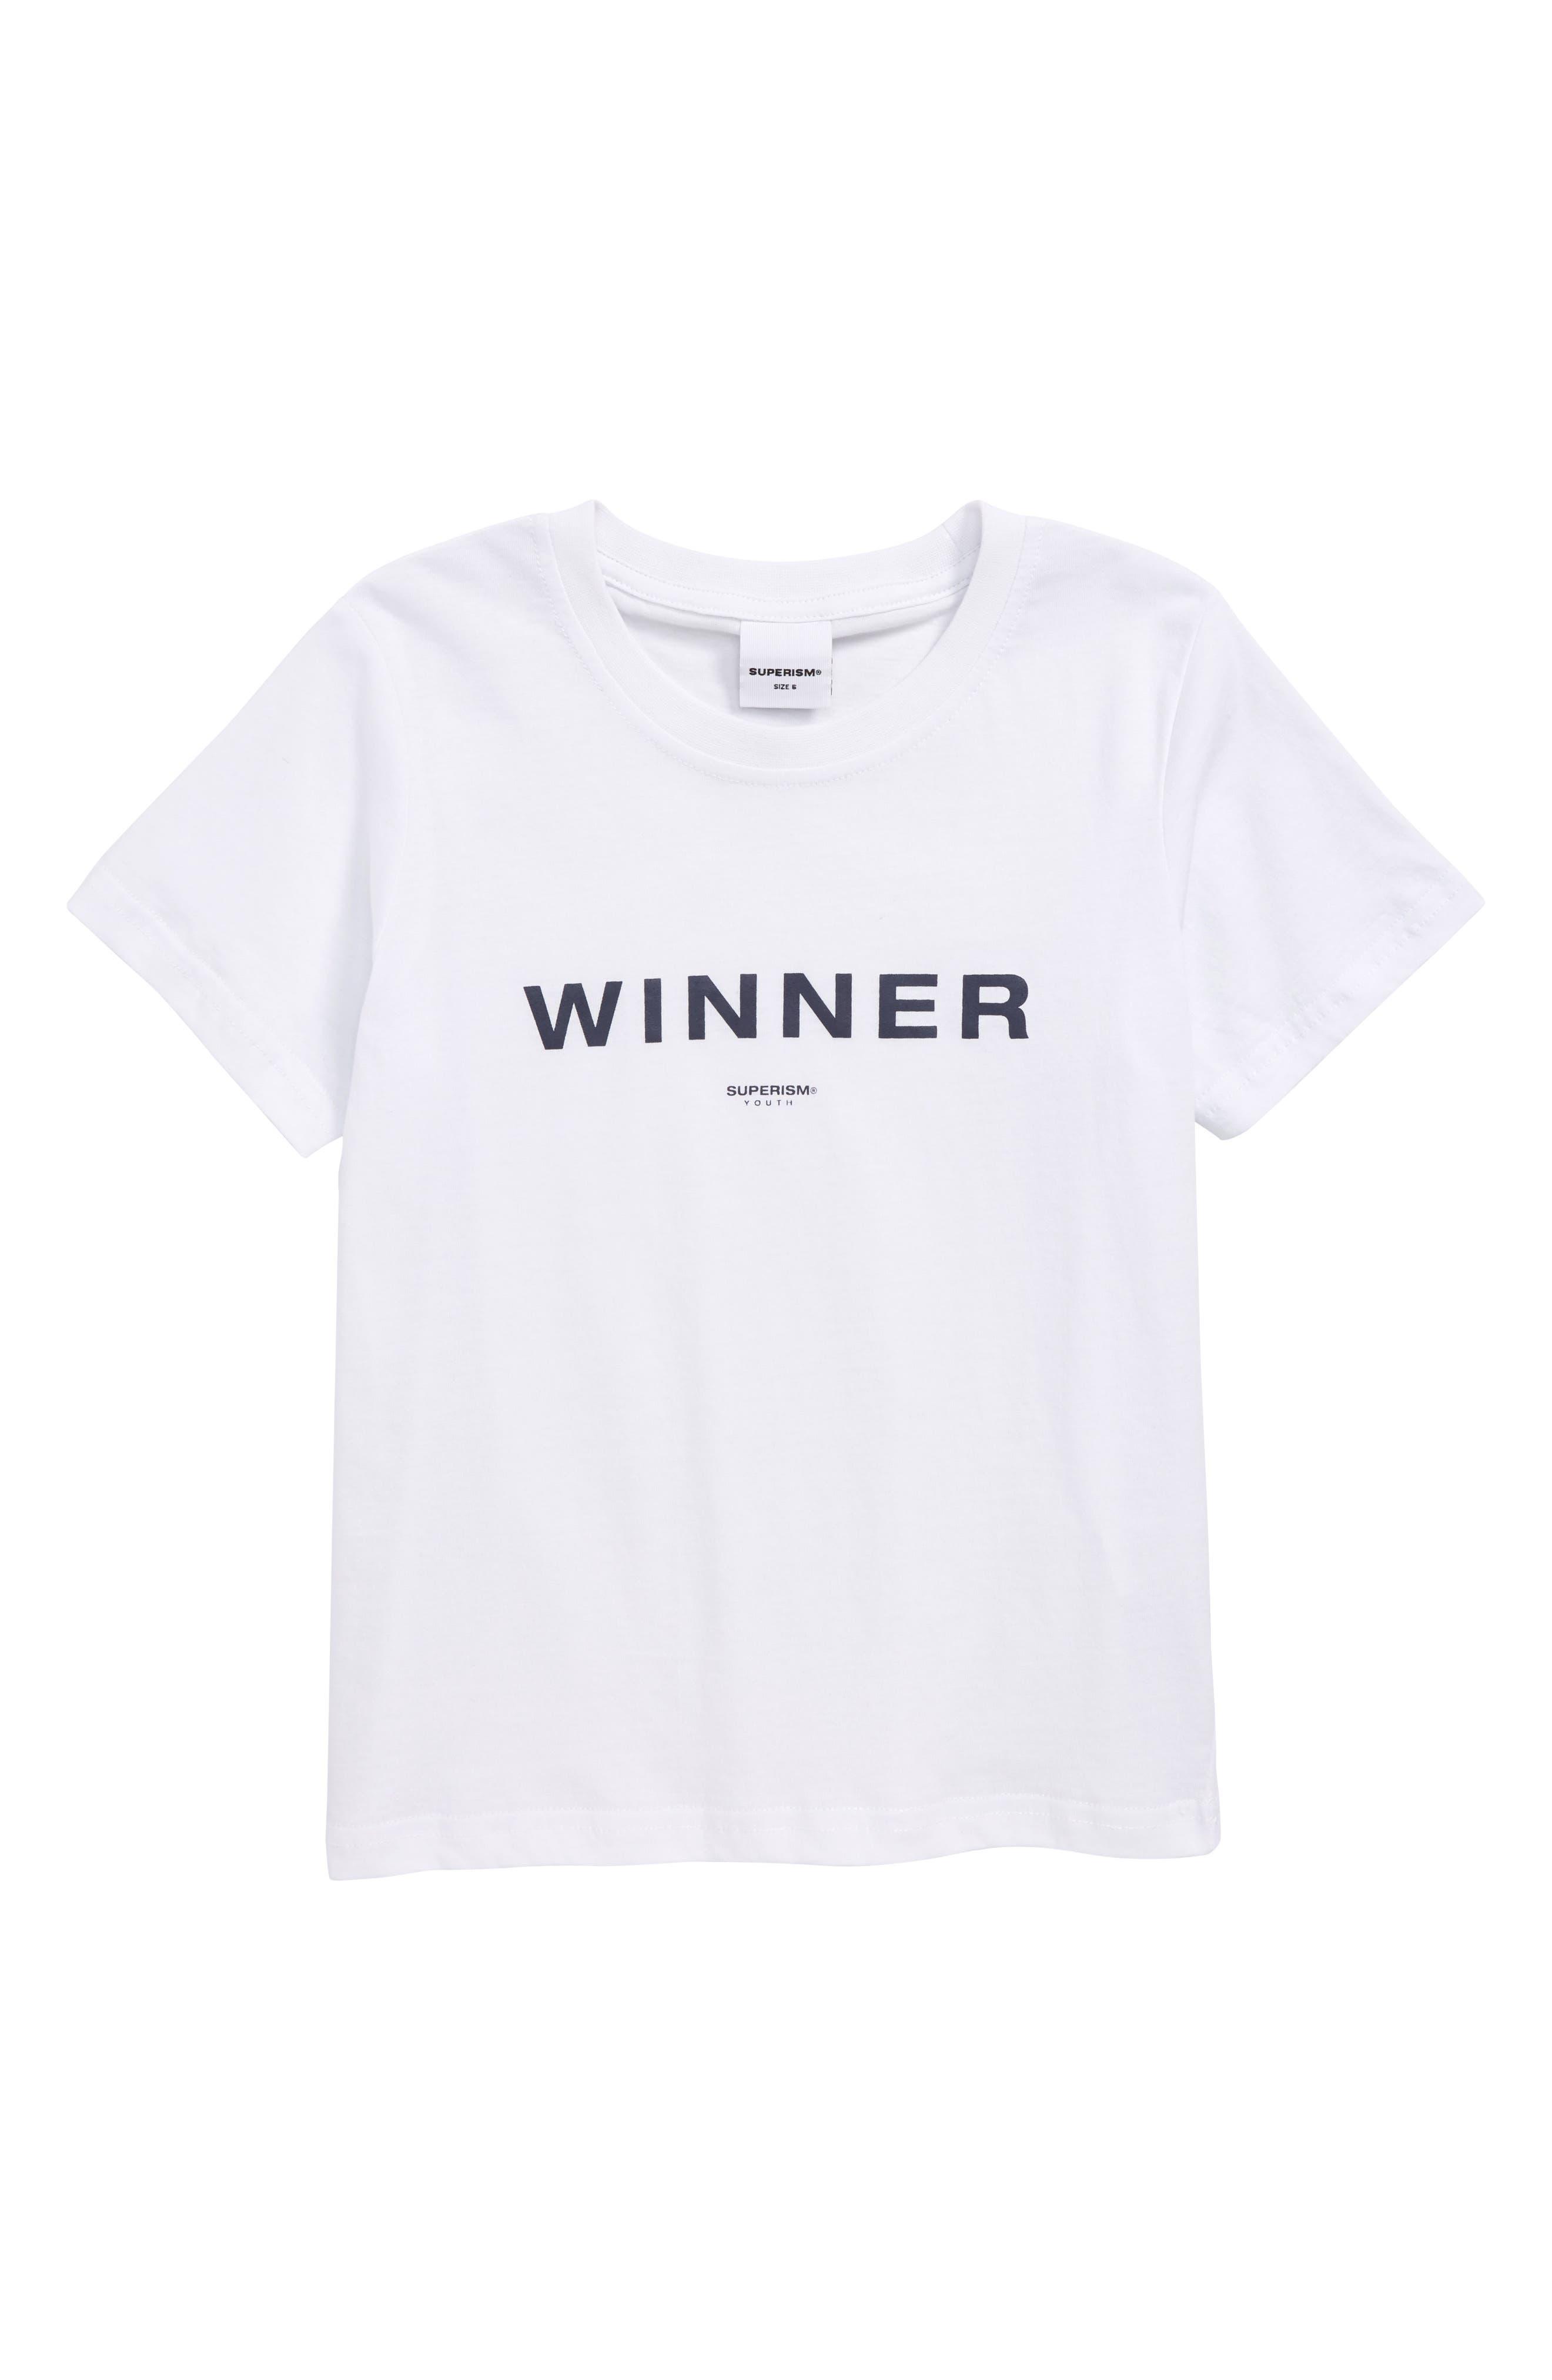 Winner T-Shirt,                             Main thumbnail 1, color,                             WHITE